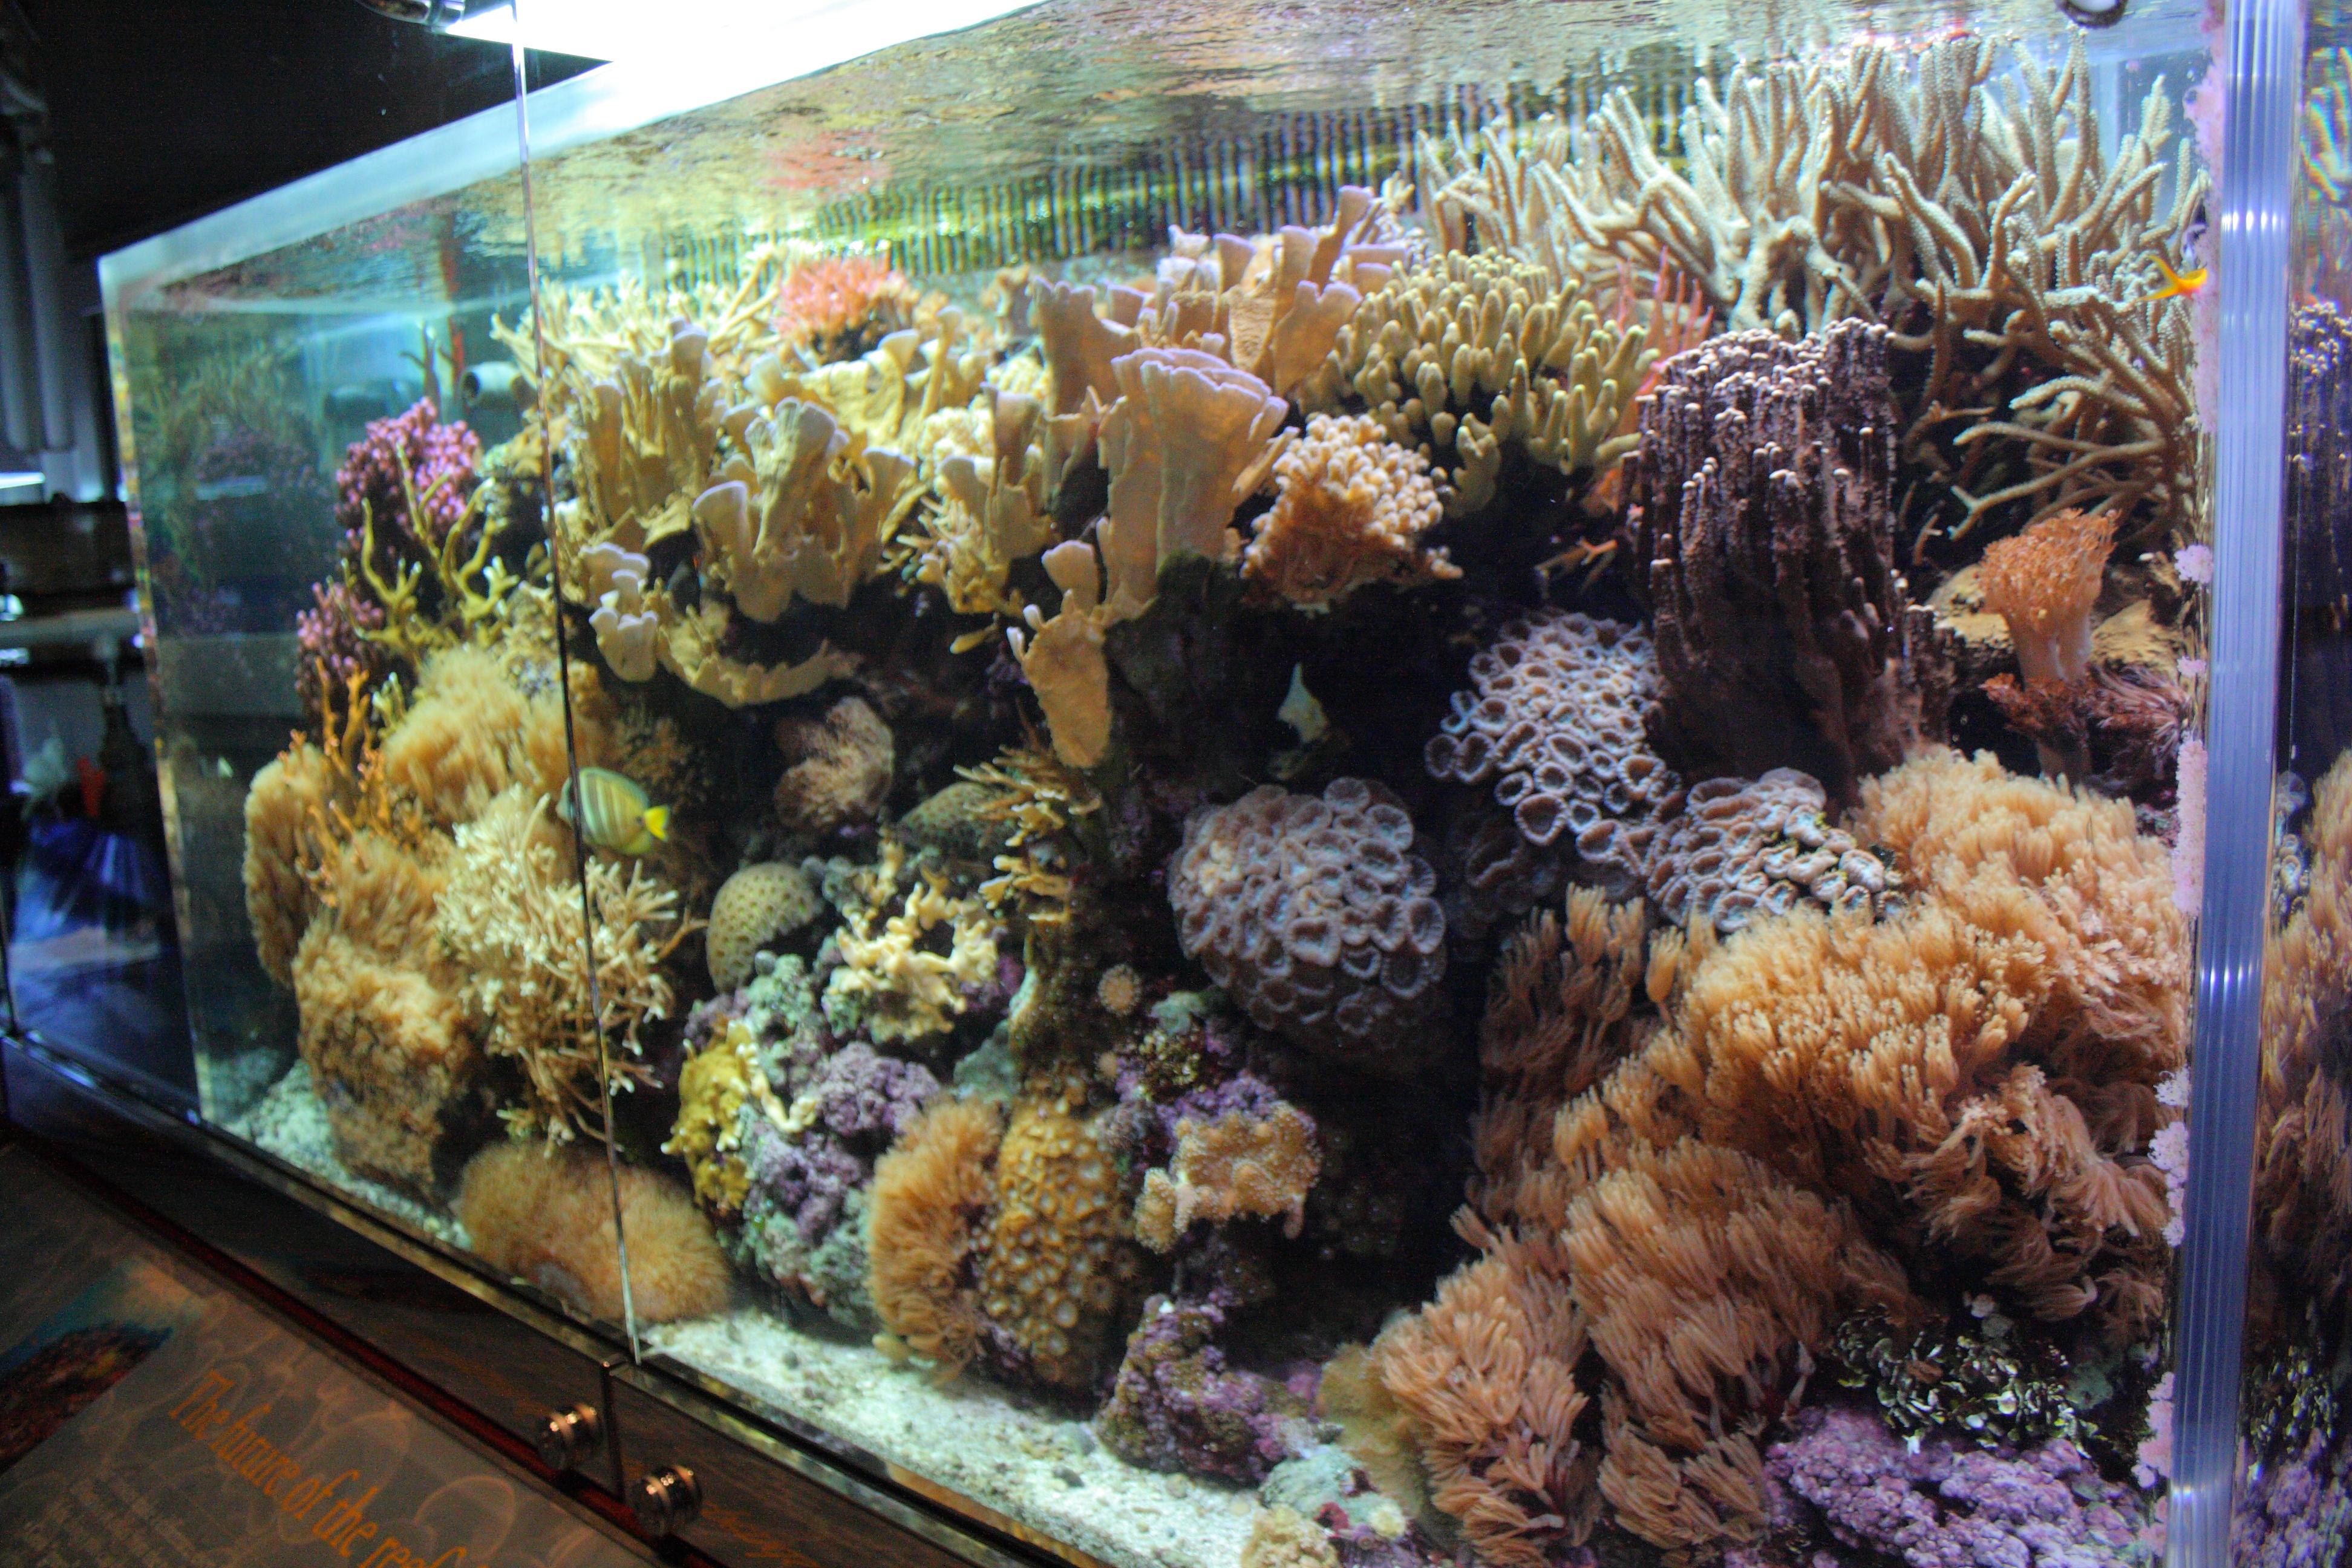 File Wild Reef At Shedd Aquarium 9 2009 11 15 Jpg Wikimedia Commons